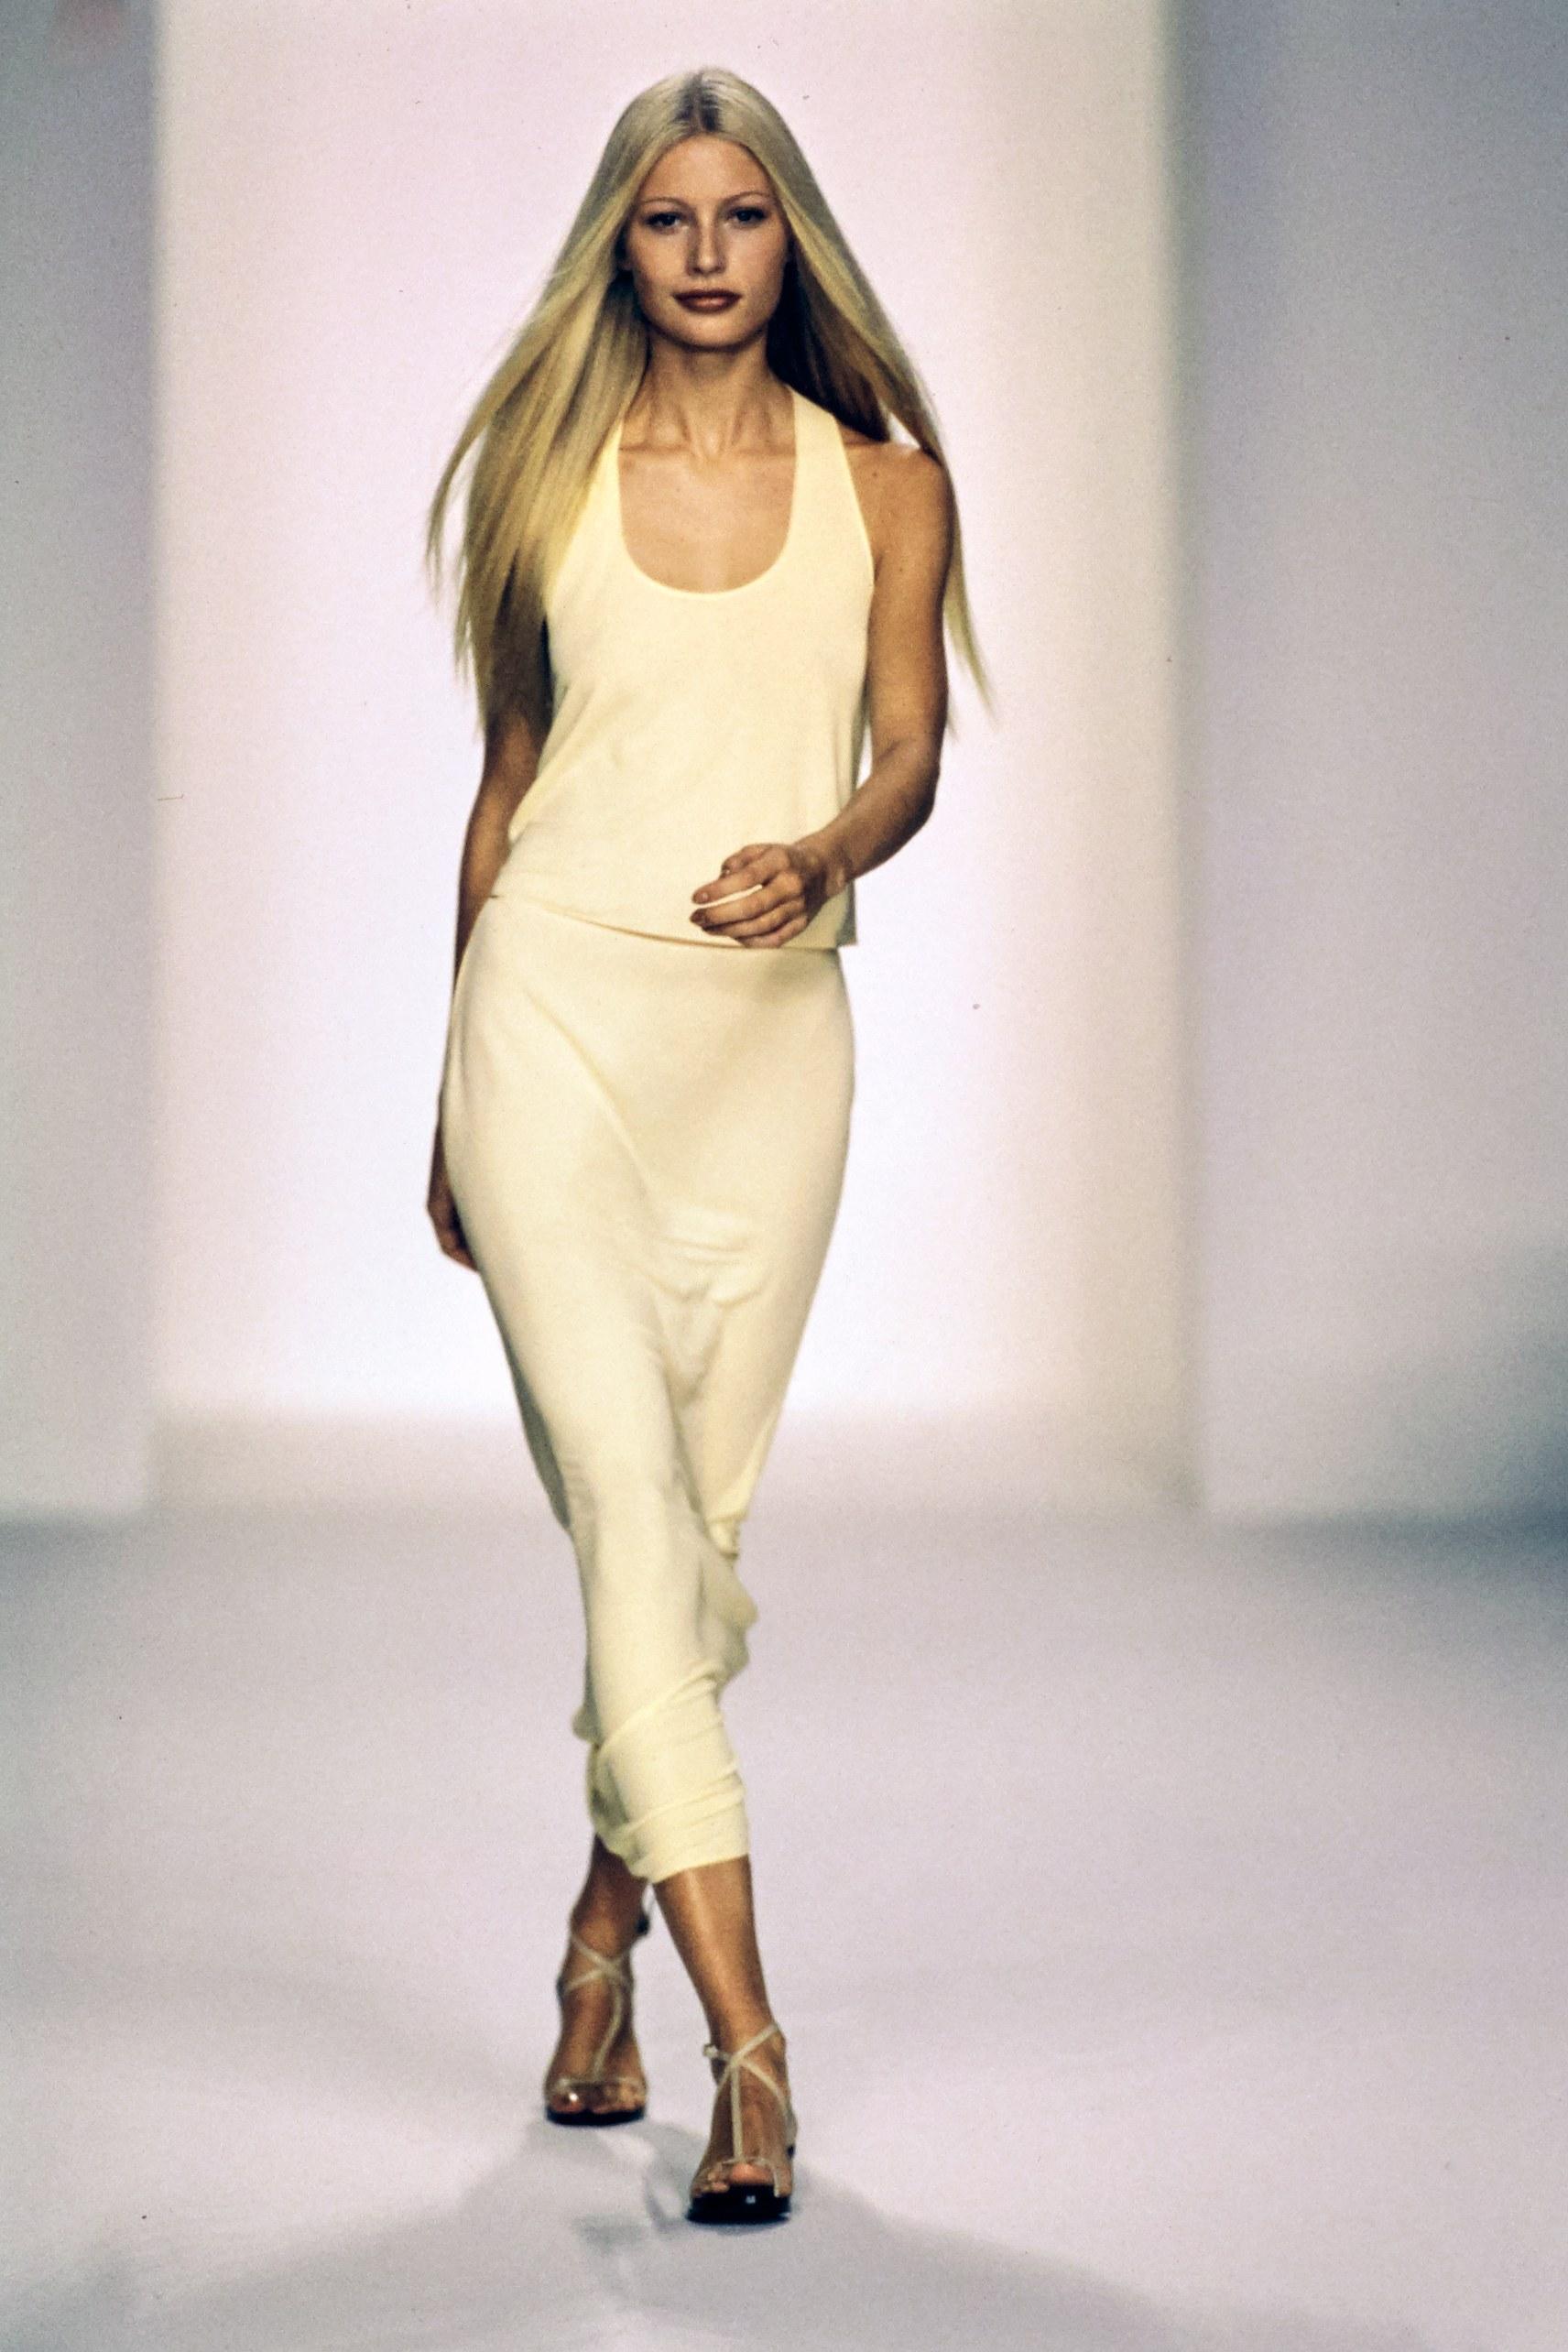 Roseanne Supernault pics